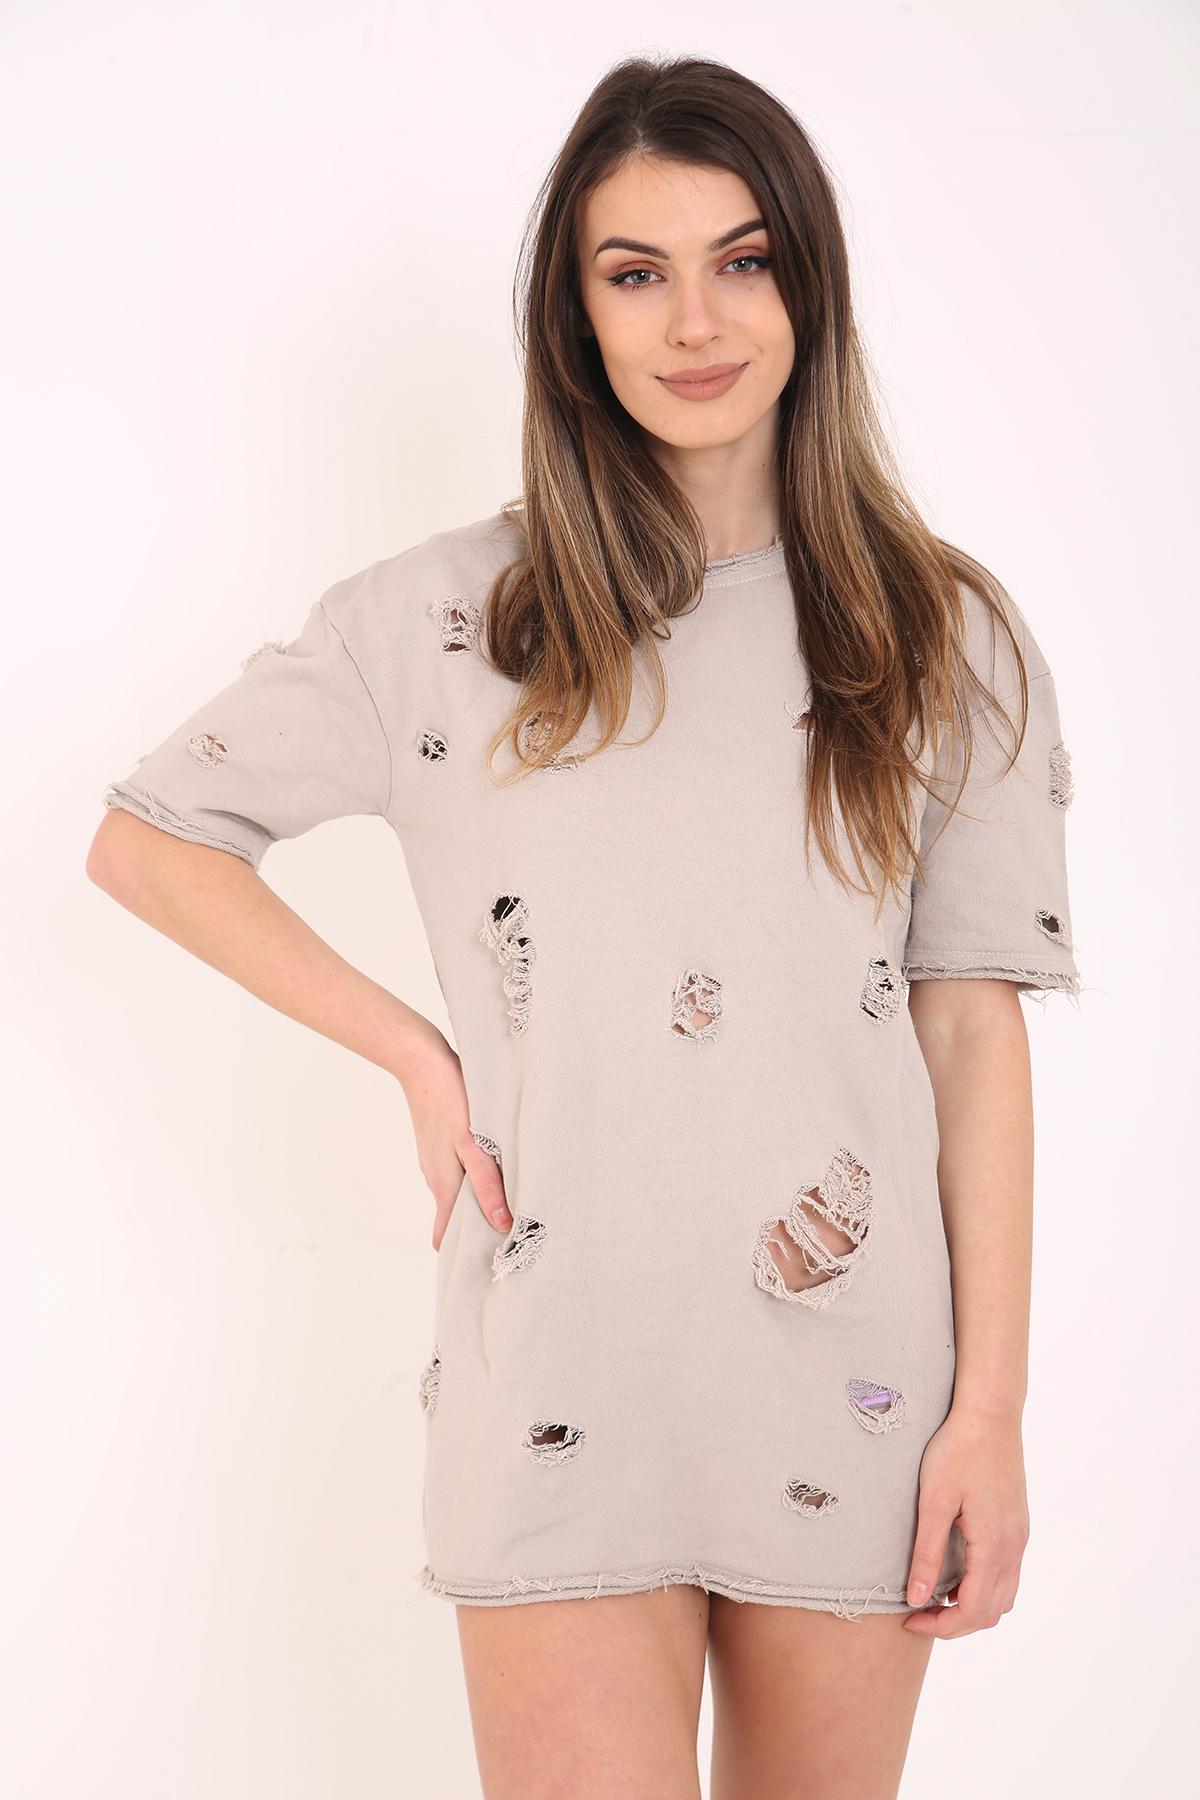 Ladies clothing and shoe wholesaler stylewise direct uk for Celebrity t shirts wholesale